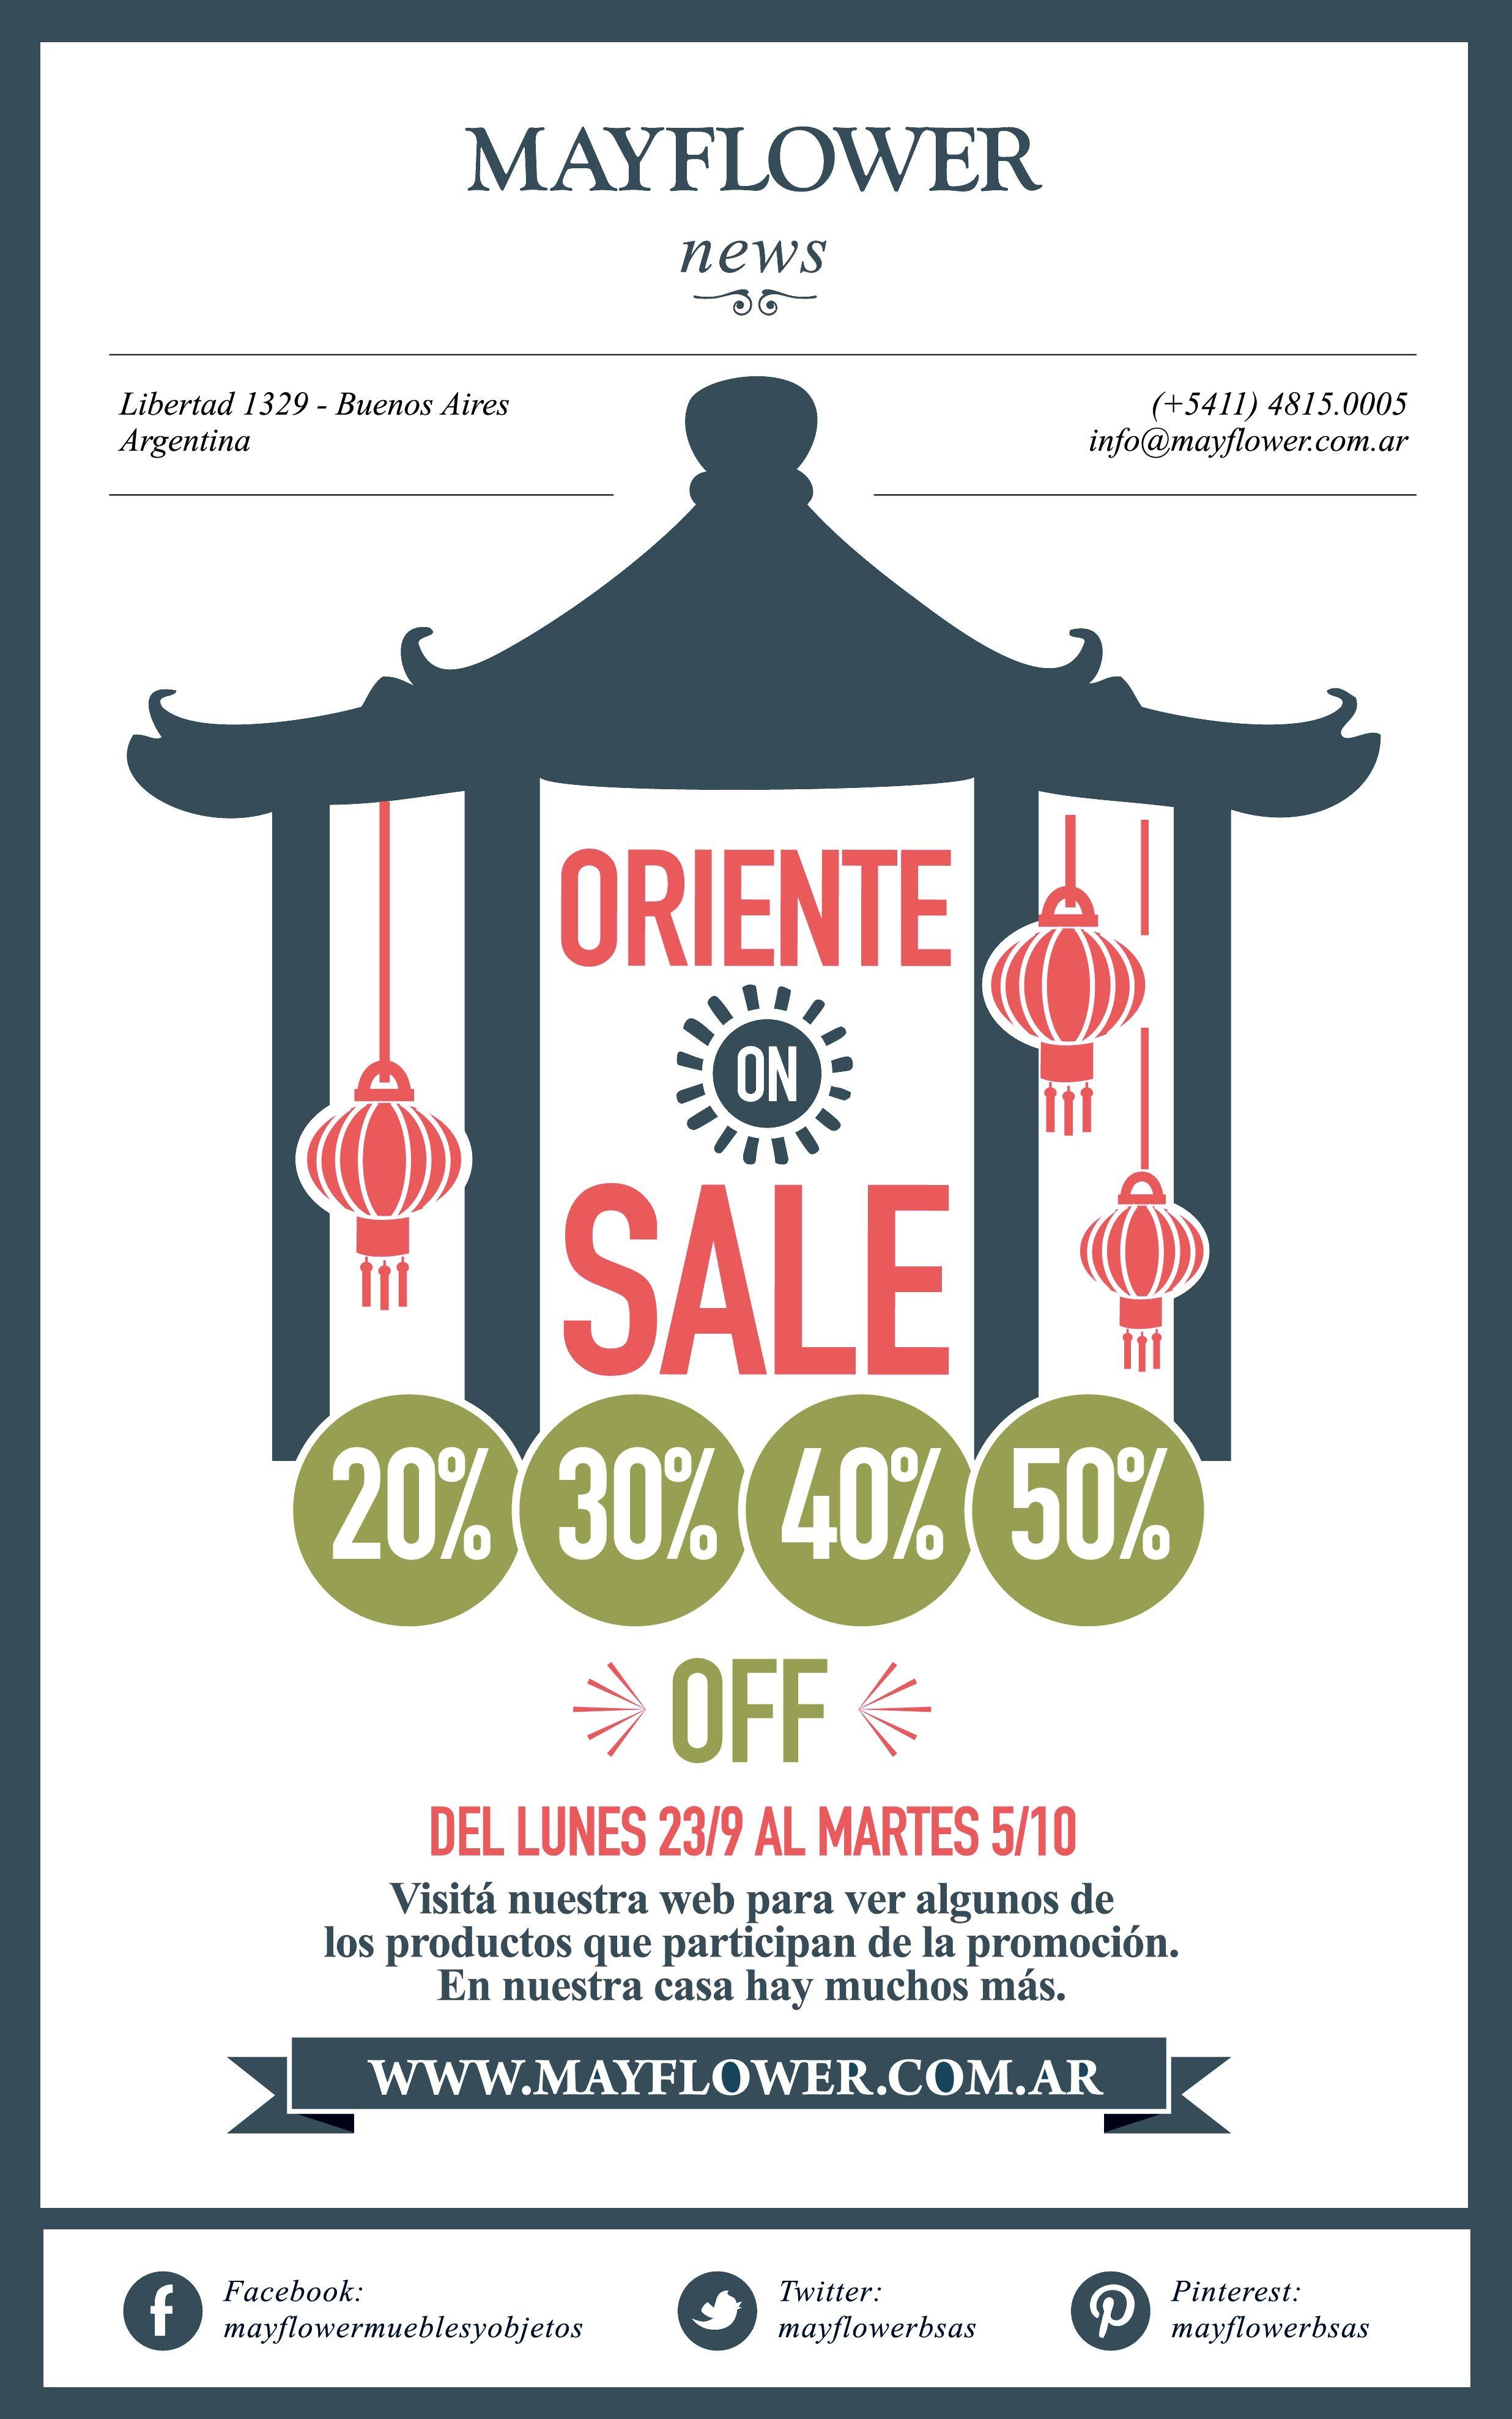 50 år vers Oriente On Sale en Mayflower: muebles, objetos, iluminación, arte  50 år vers